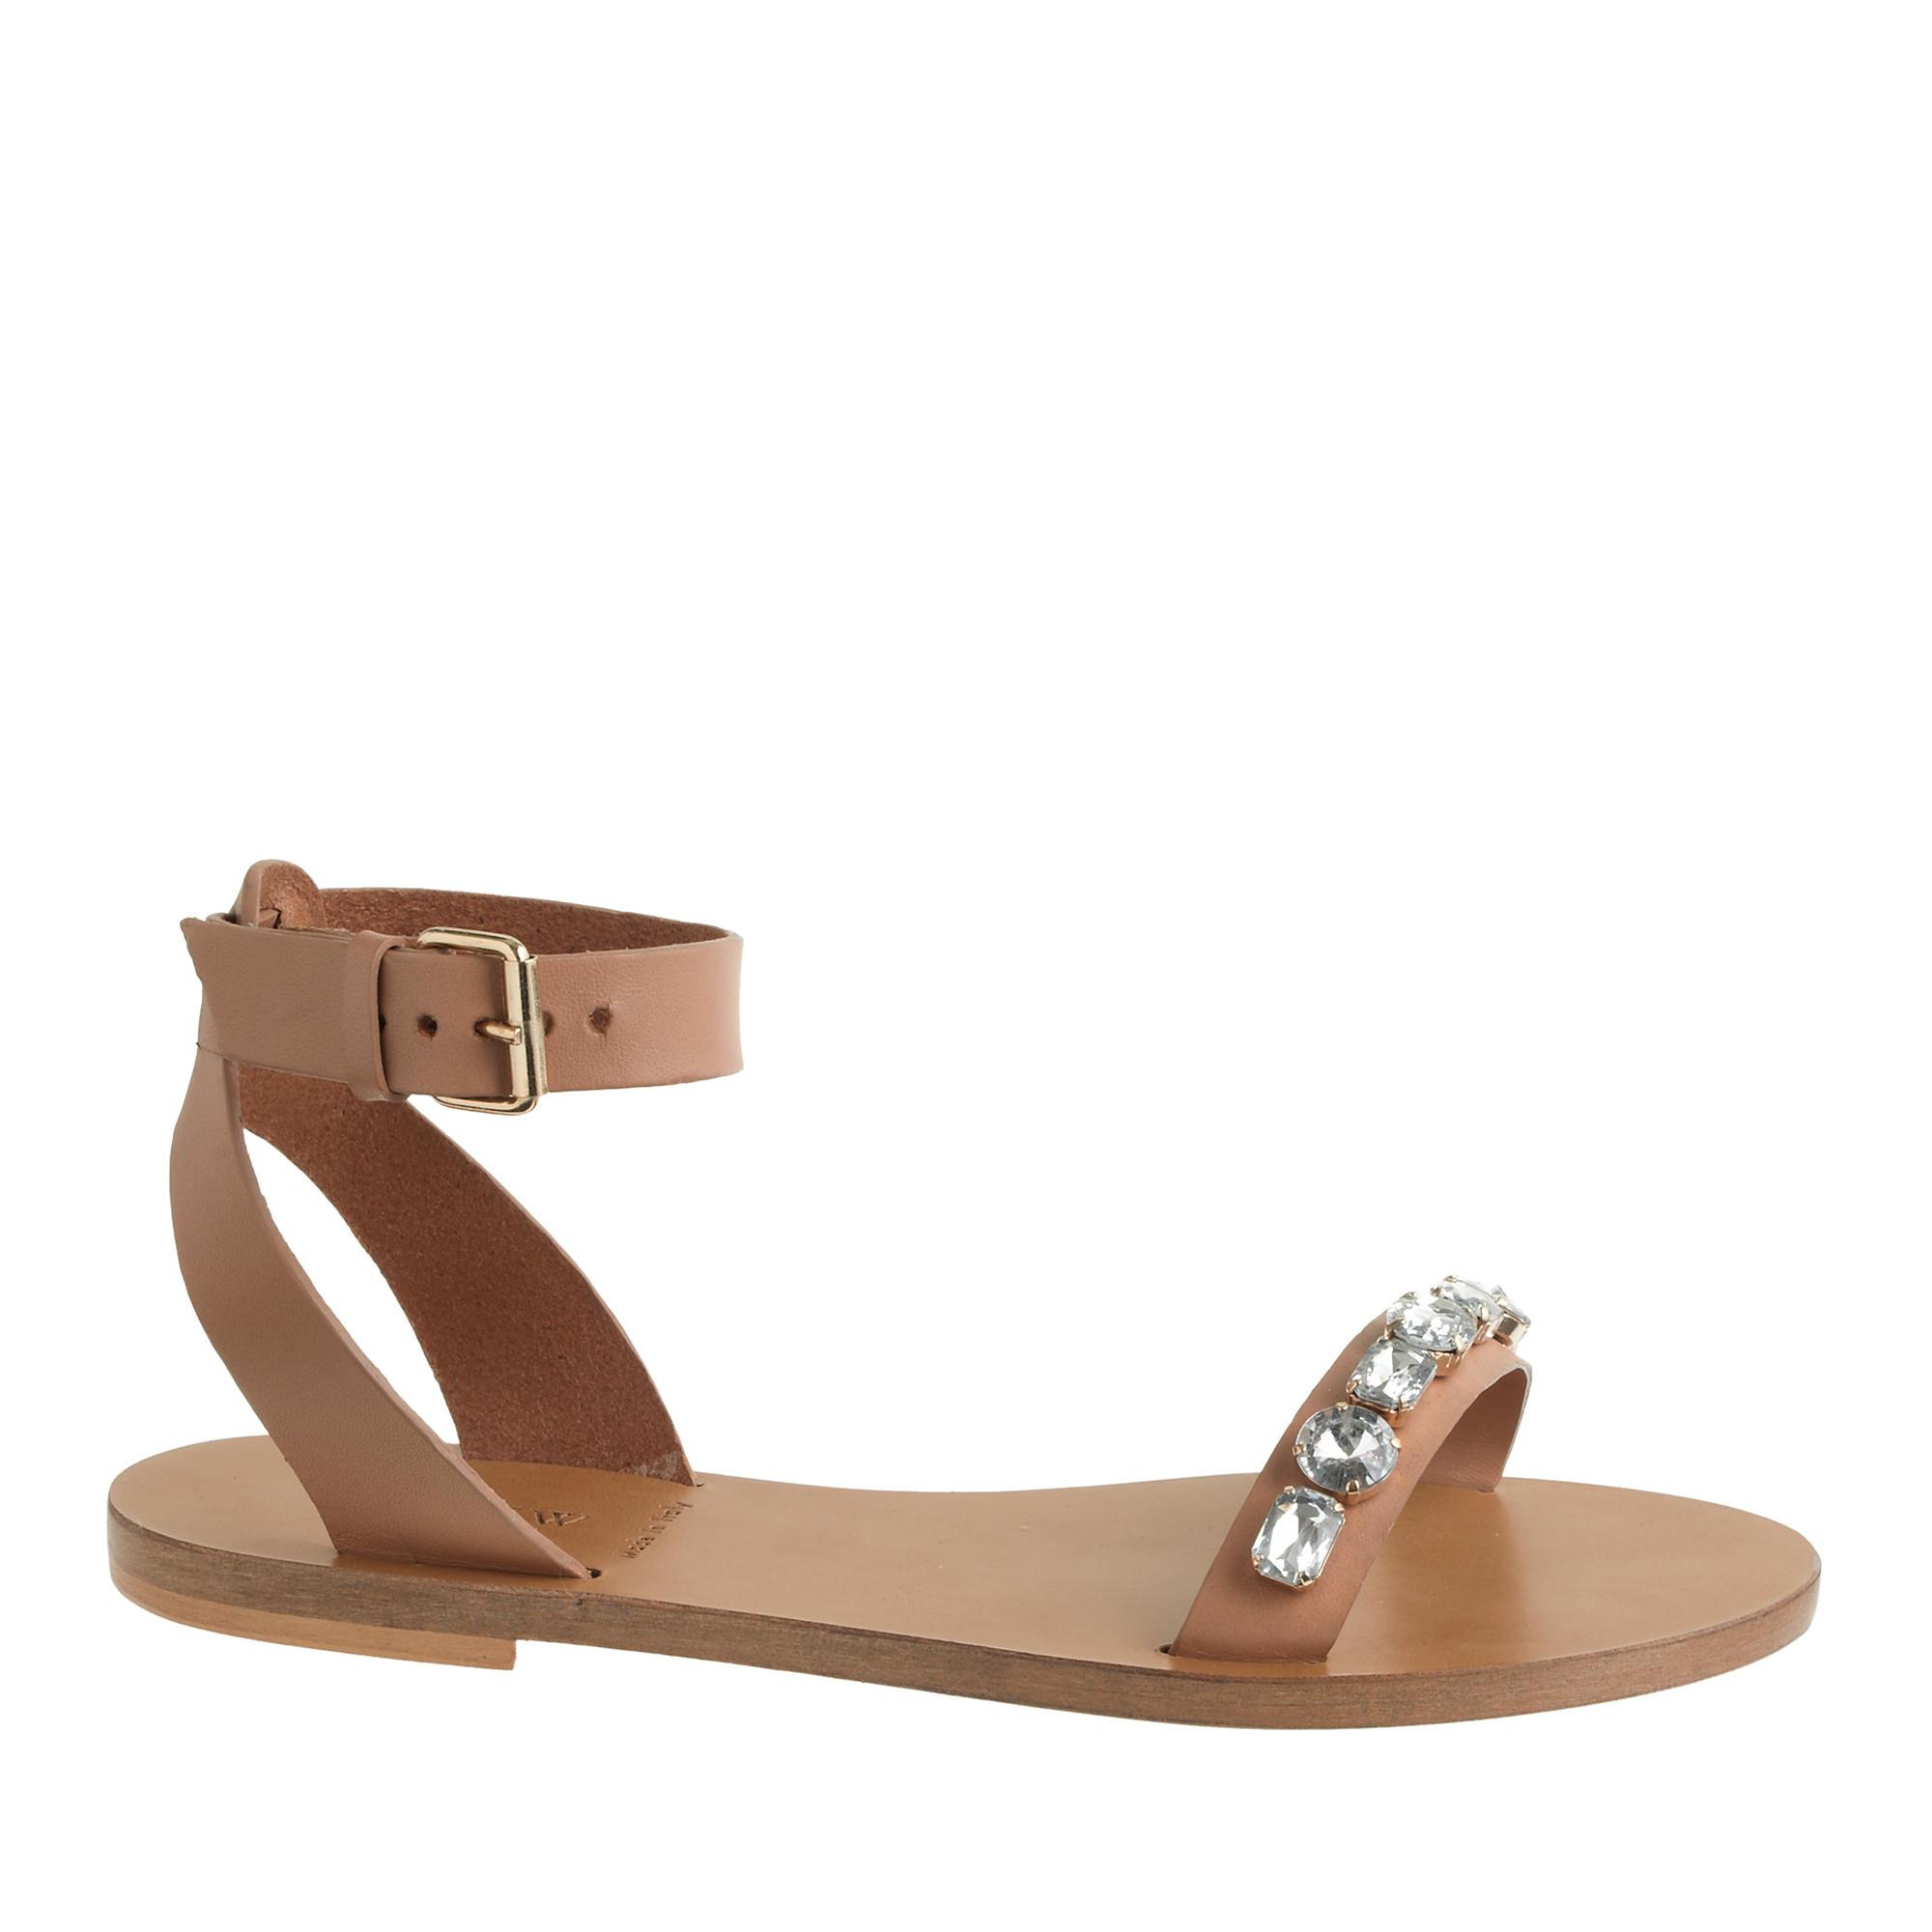 J.crew Jeweled Flat Sandals In Natural | Lyst